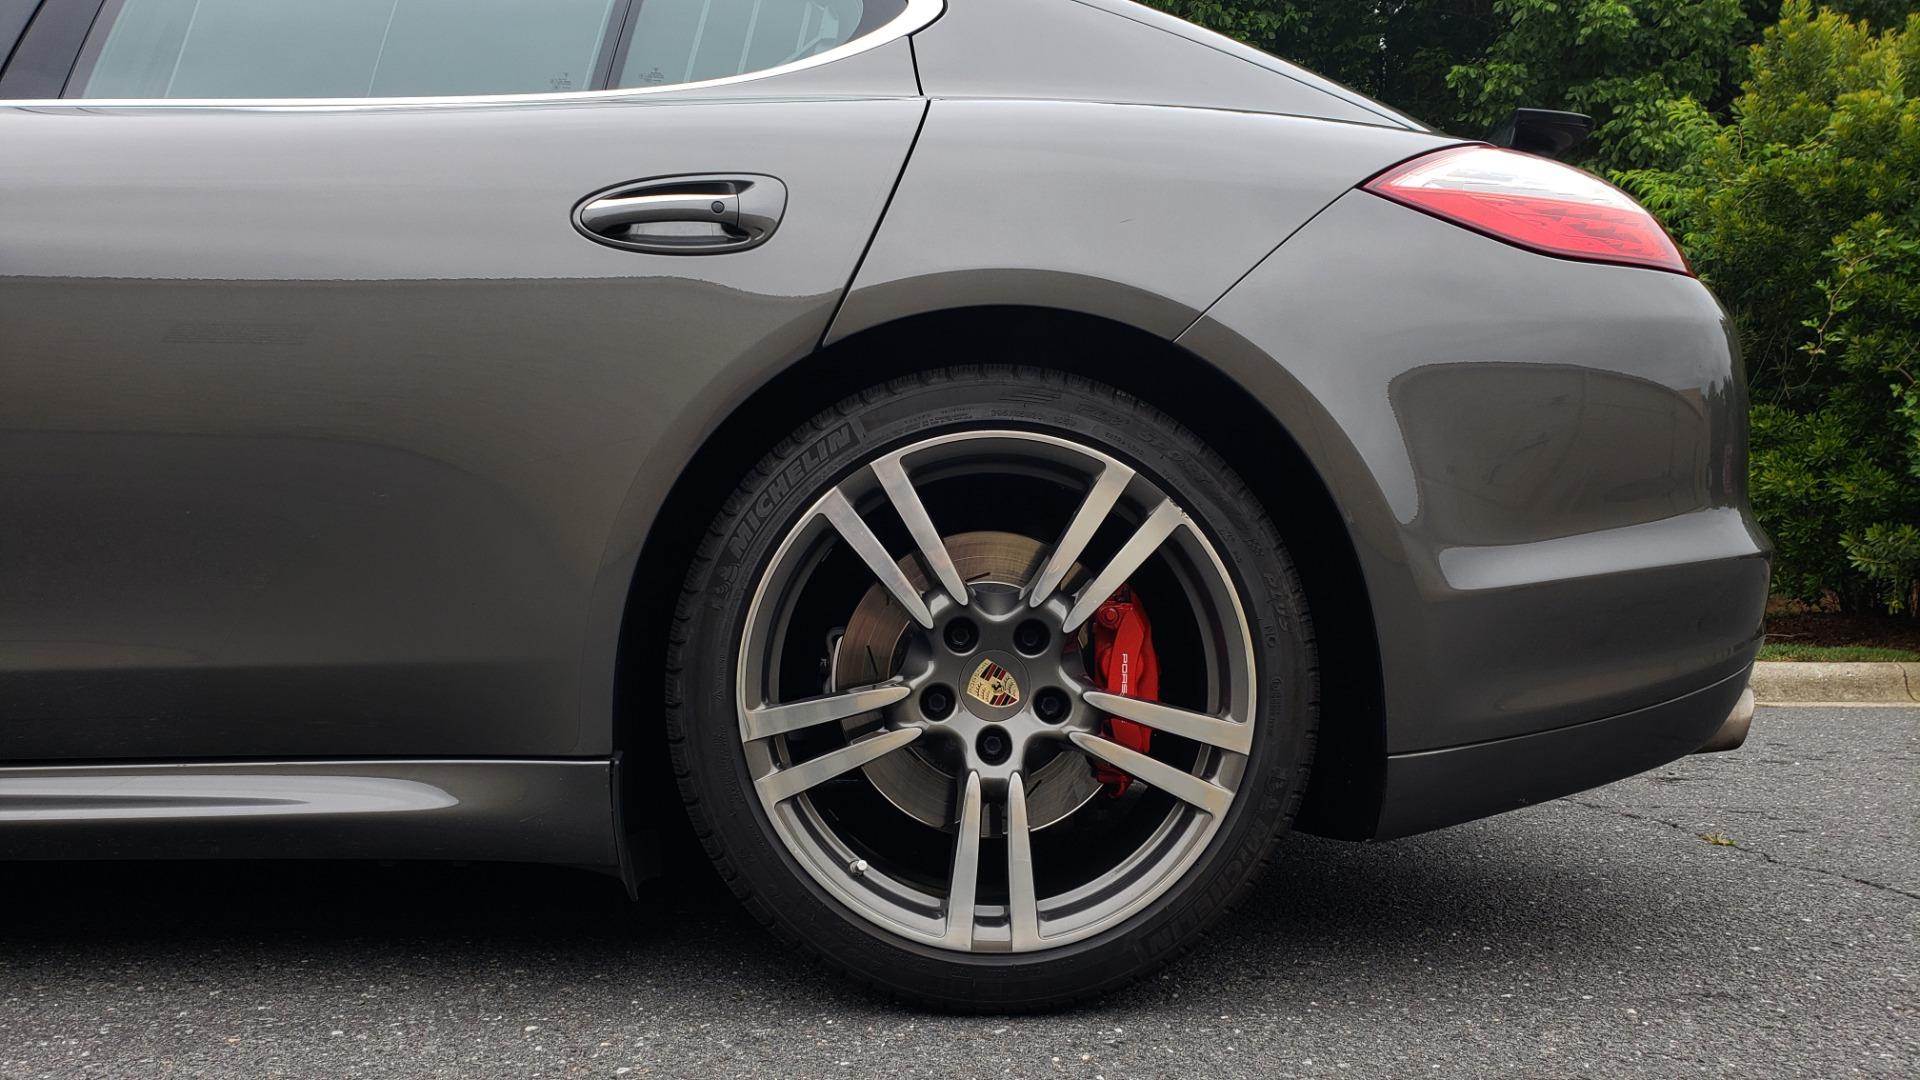 Used 2013 Porsche PANAMERA TURBO 4.8L V8 / AWD / NAV / SUNROOF / LCA / PARK ASST / BURMESTER for sale $45,995 at Formula Imports in Charlotte NC 28227 89